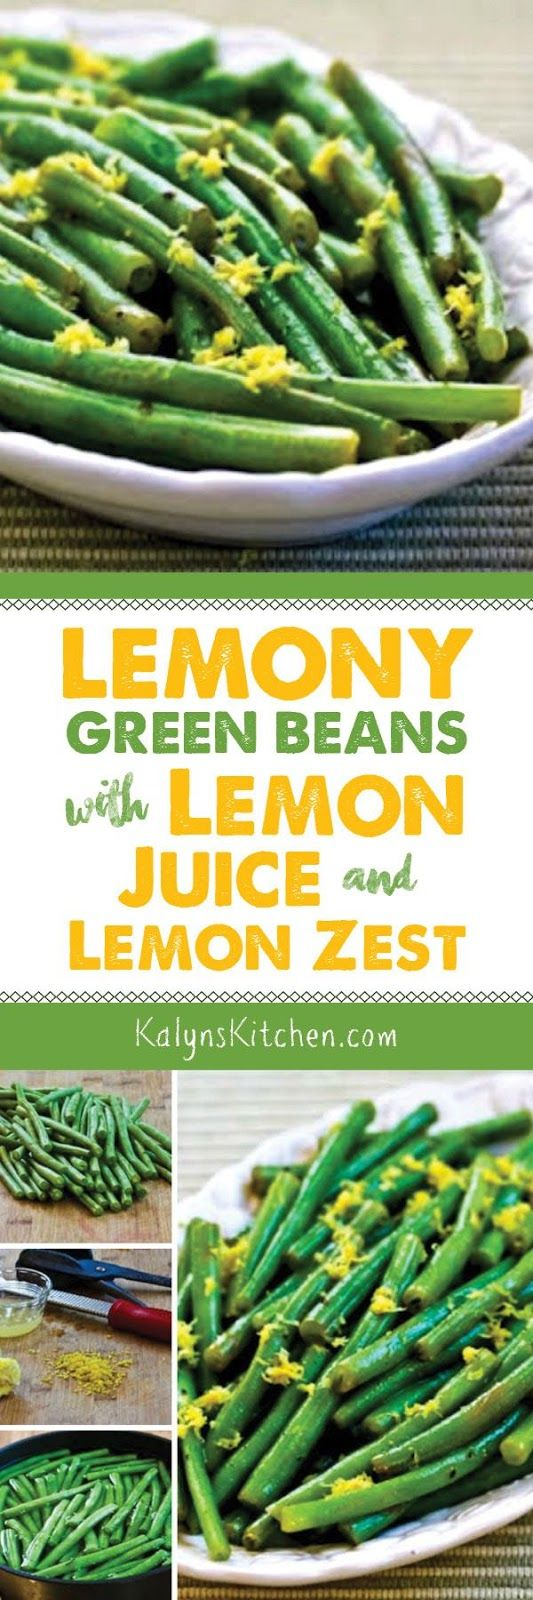 , this recipe for Lemony Green Beans with Lemon Juice and Lemon Zest ...